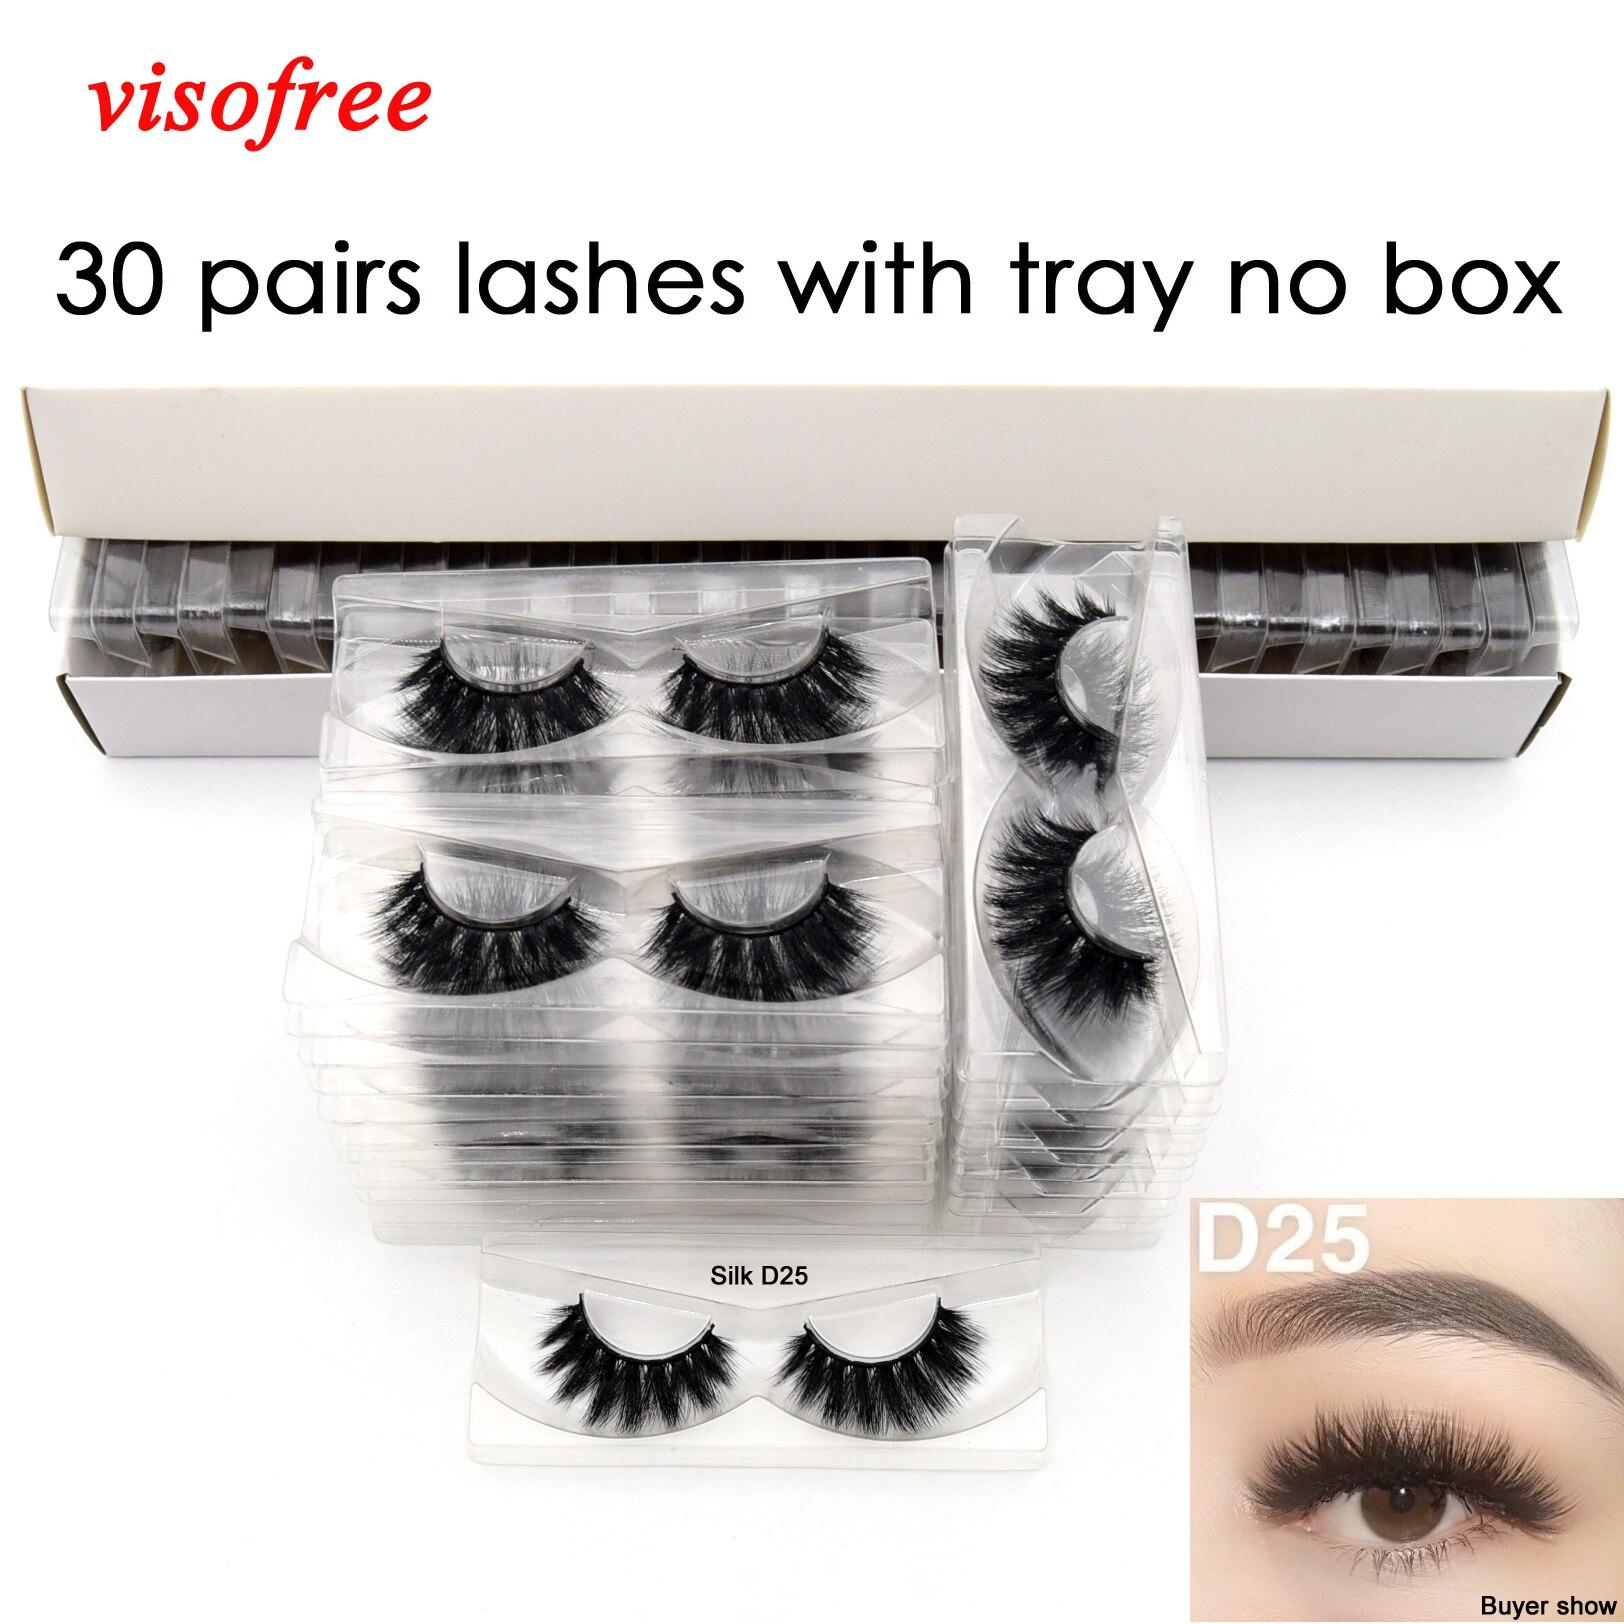 Visofree 30 Pairs/lot 3D Faux Mink Lashes With Tray No Box Handmade Full Strip Eye Lashes Fake Eyelashes Makeup Eyelashes Cilios